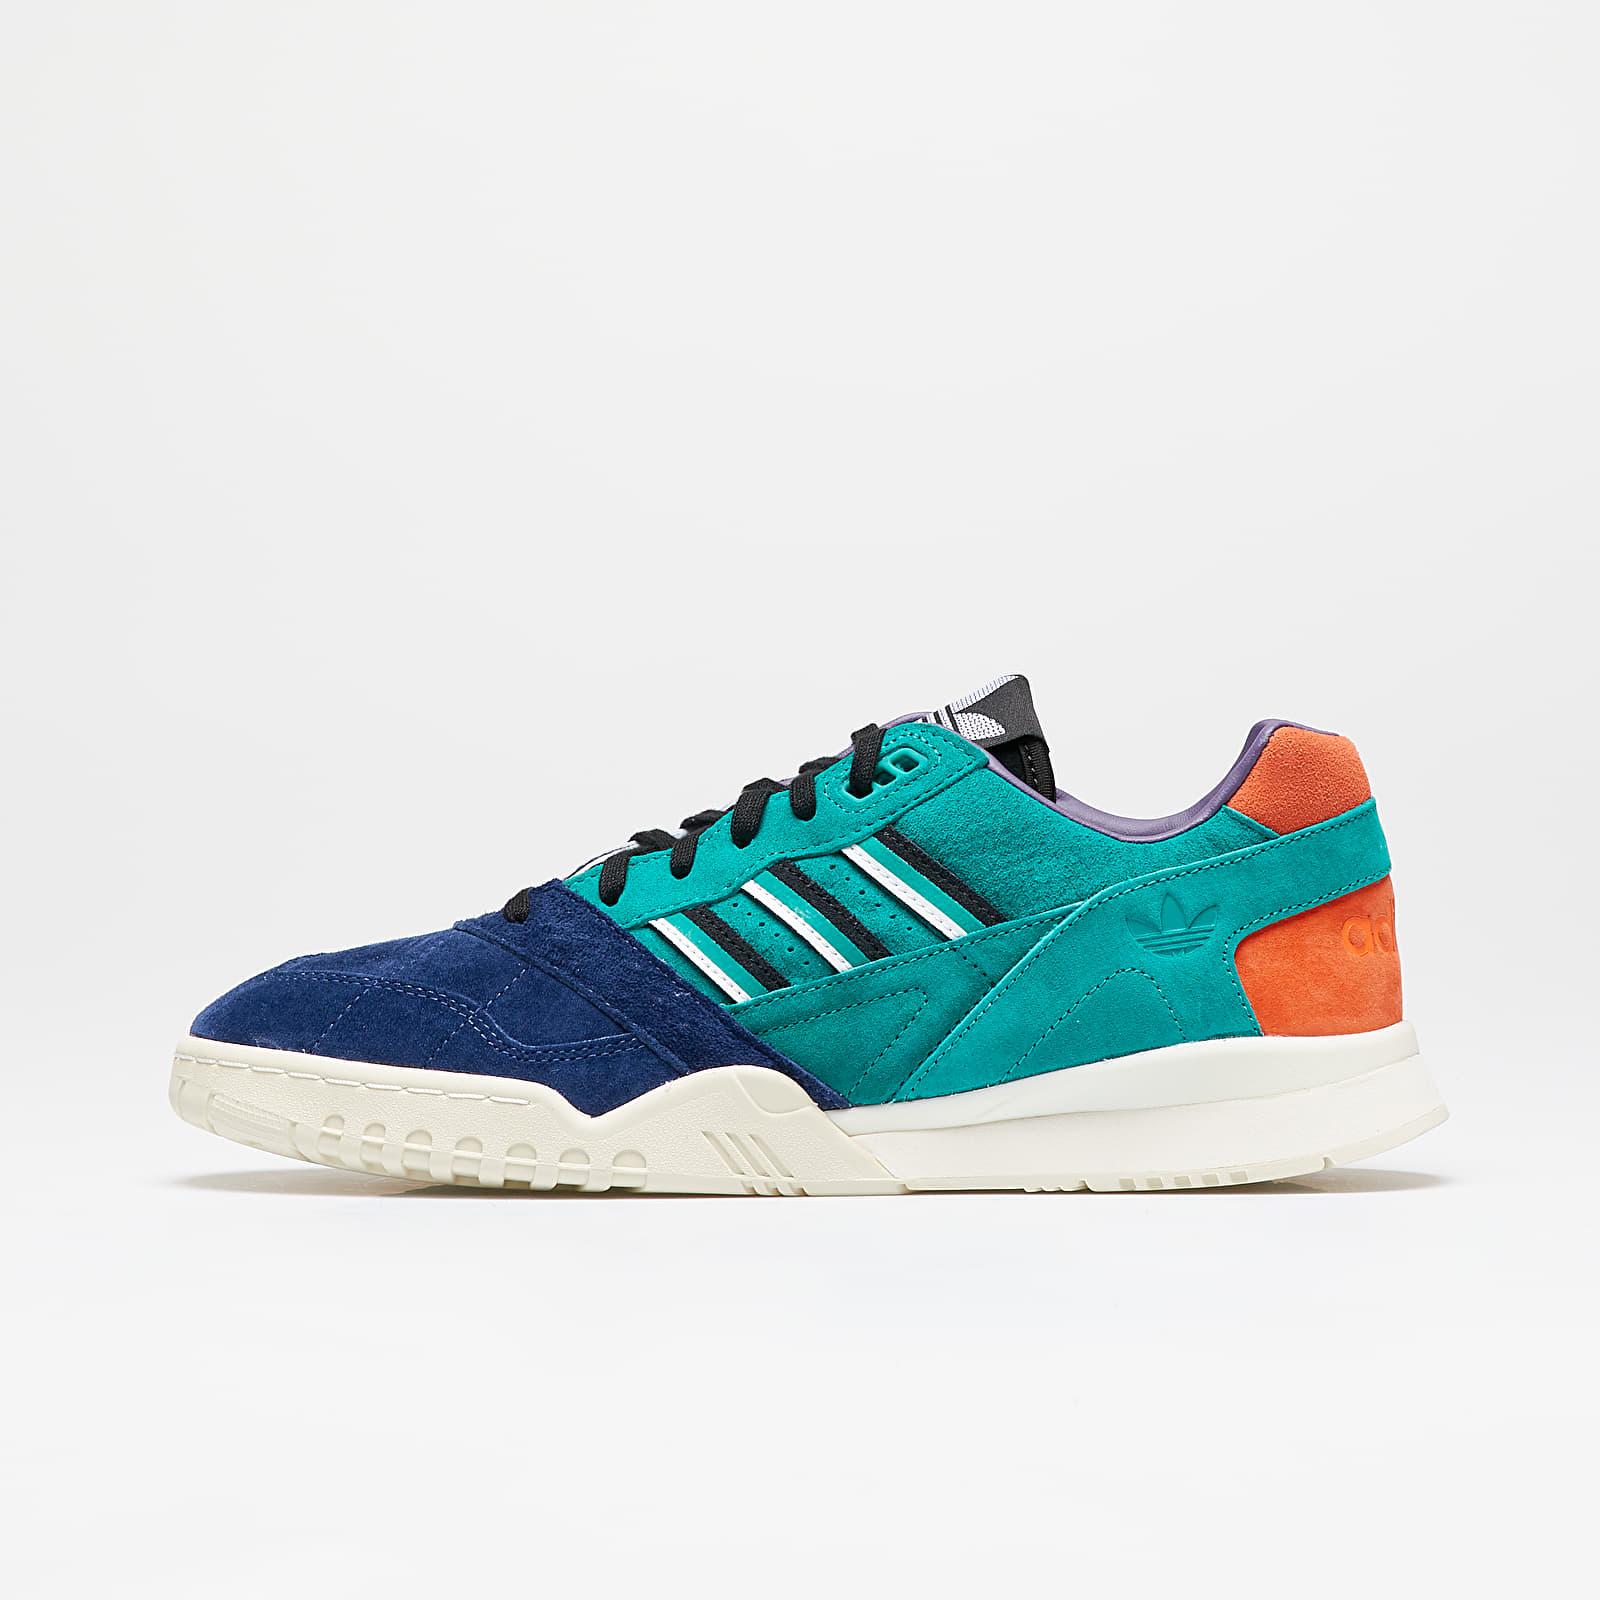 Pánské tenisky a boty adidas A.R. Trainer Glow Green/ Tech Indigo/ Solar Orange